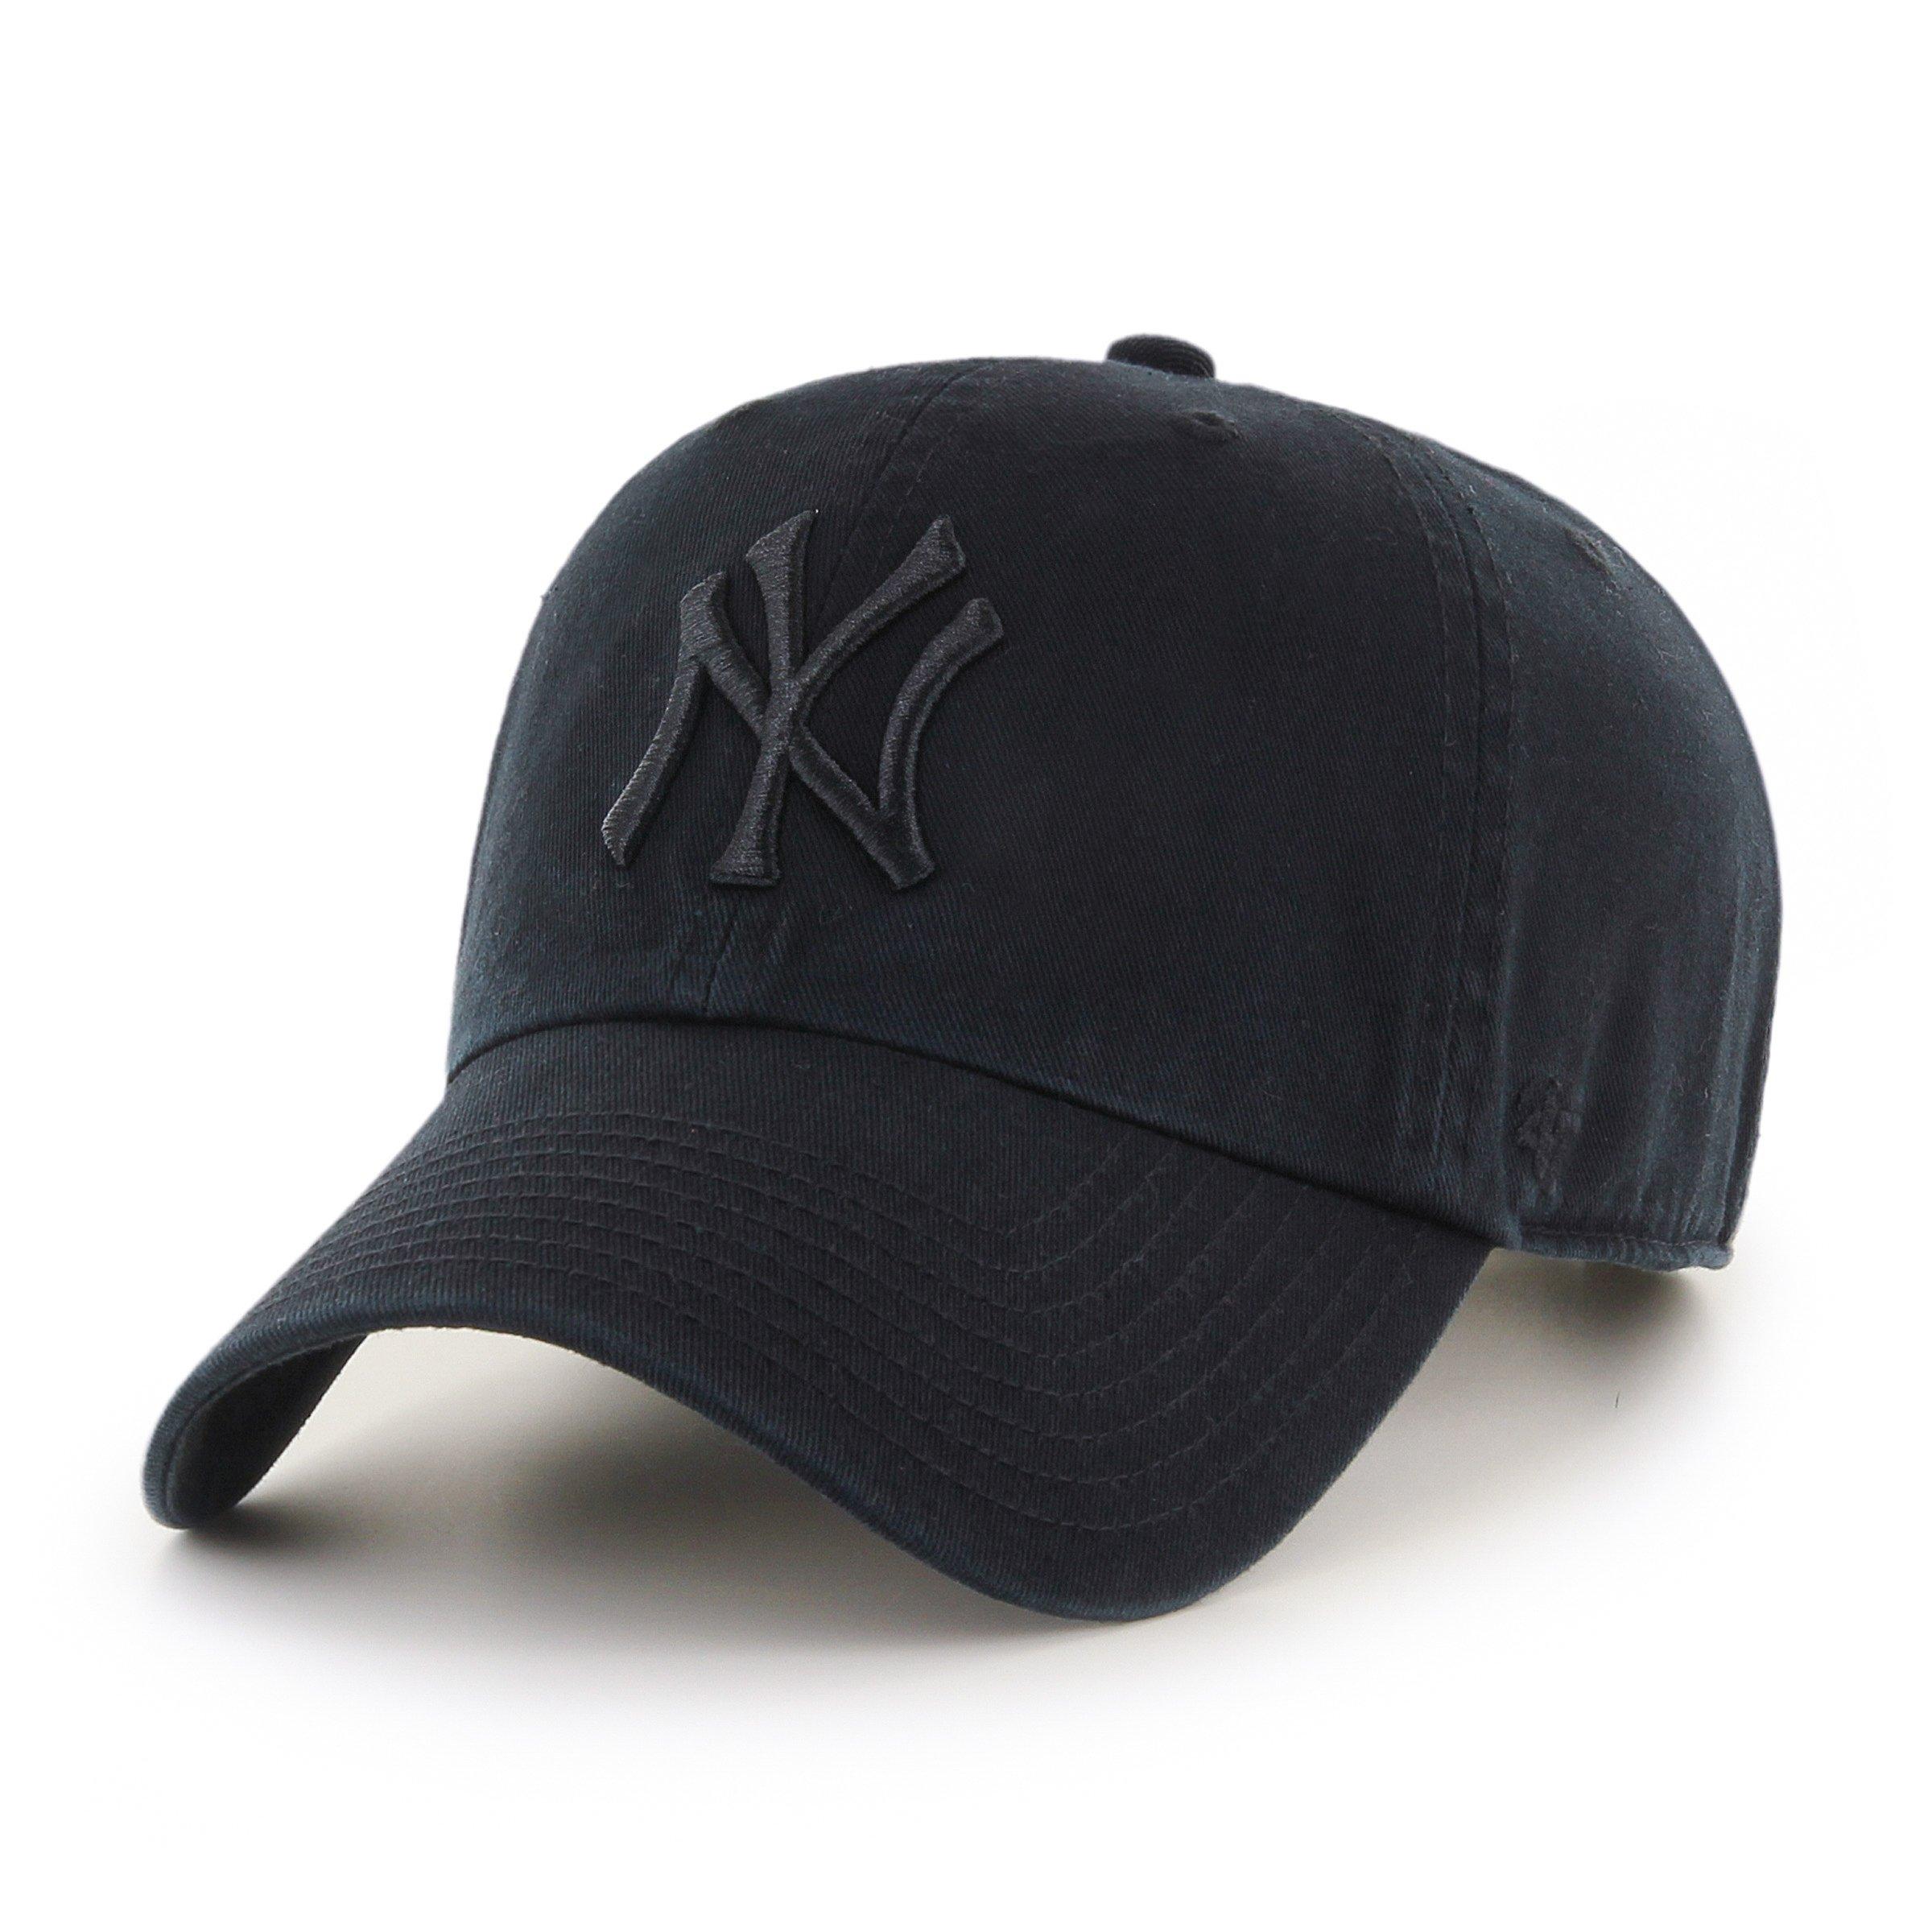 '47 New York Yankees Strapback Brand Clean Up Adjustable Cap Hat (Black on Black)